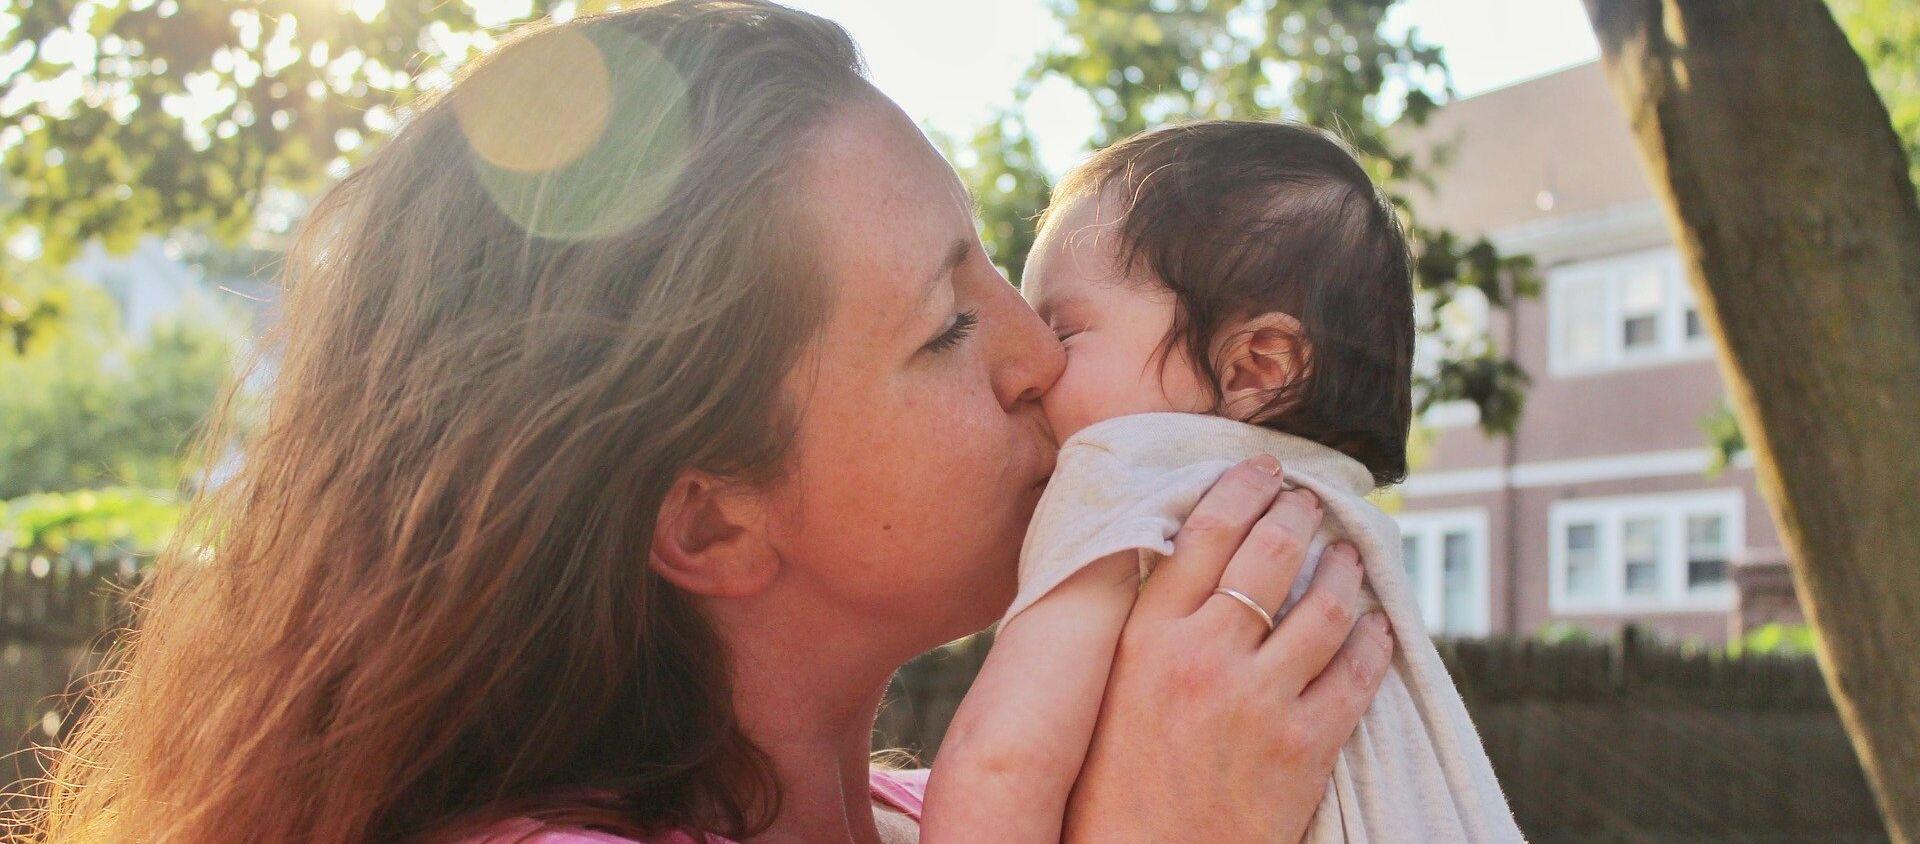 Madre besa a su bebé - Sputnik Mundo, 1920, 13.01.2021